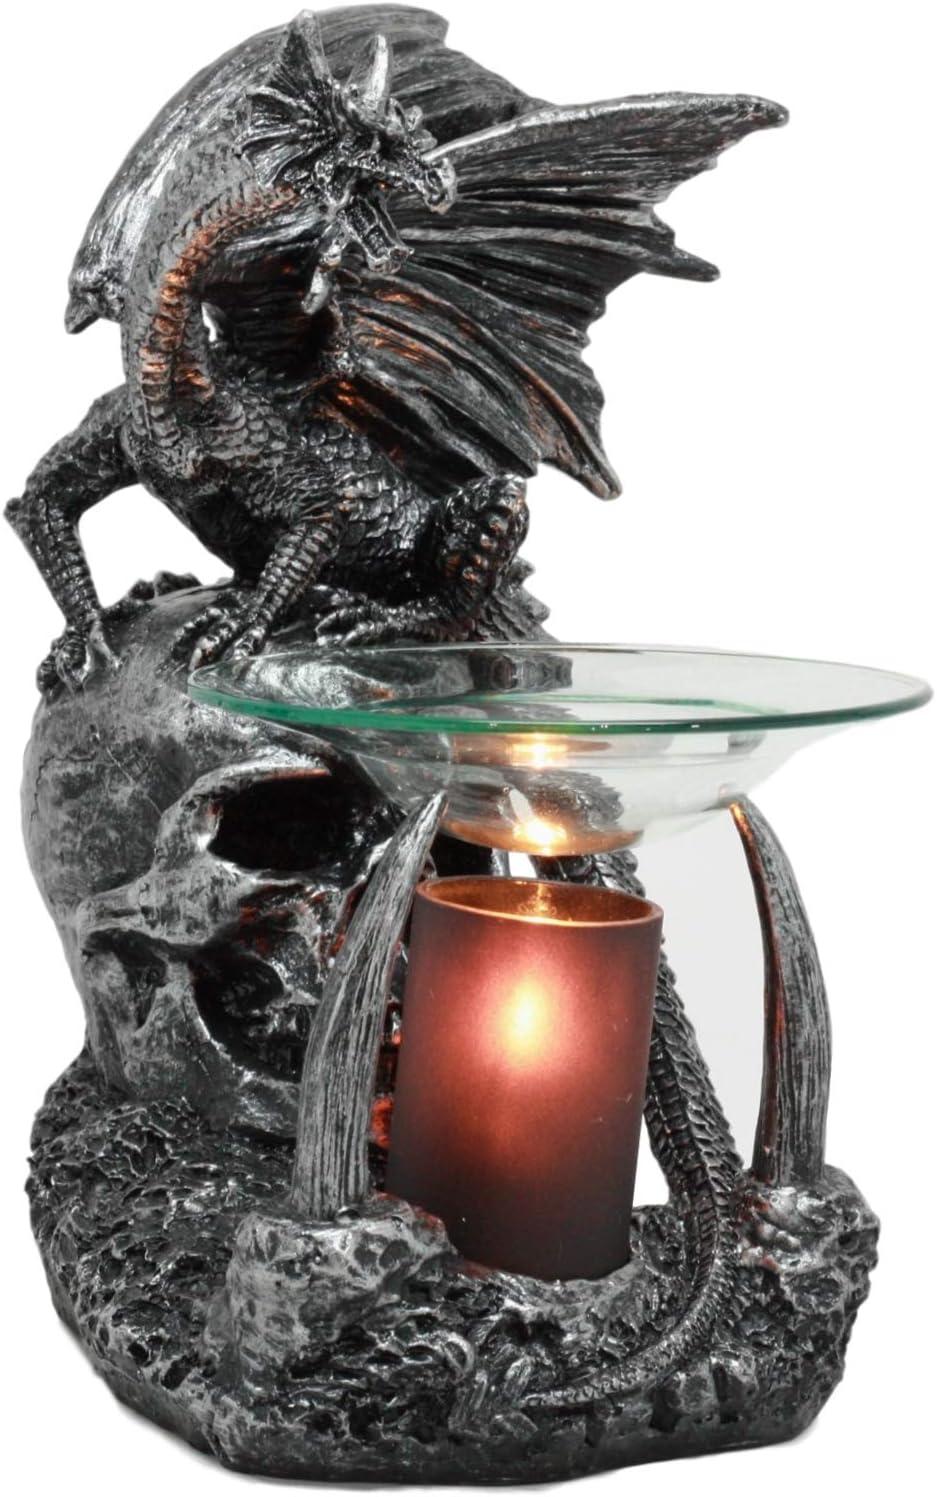 "Ebros Gothic Sabretooth Skull Graveyard Dragon Electric Oil Burner Or Tart Warmer Decor Statue 8.5"" Tall Home Fragrance Aroma Accessory Figurine"